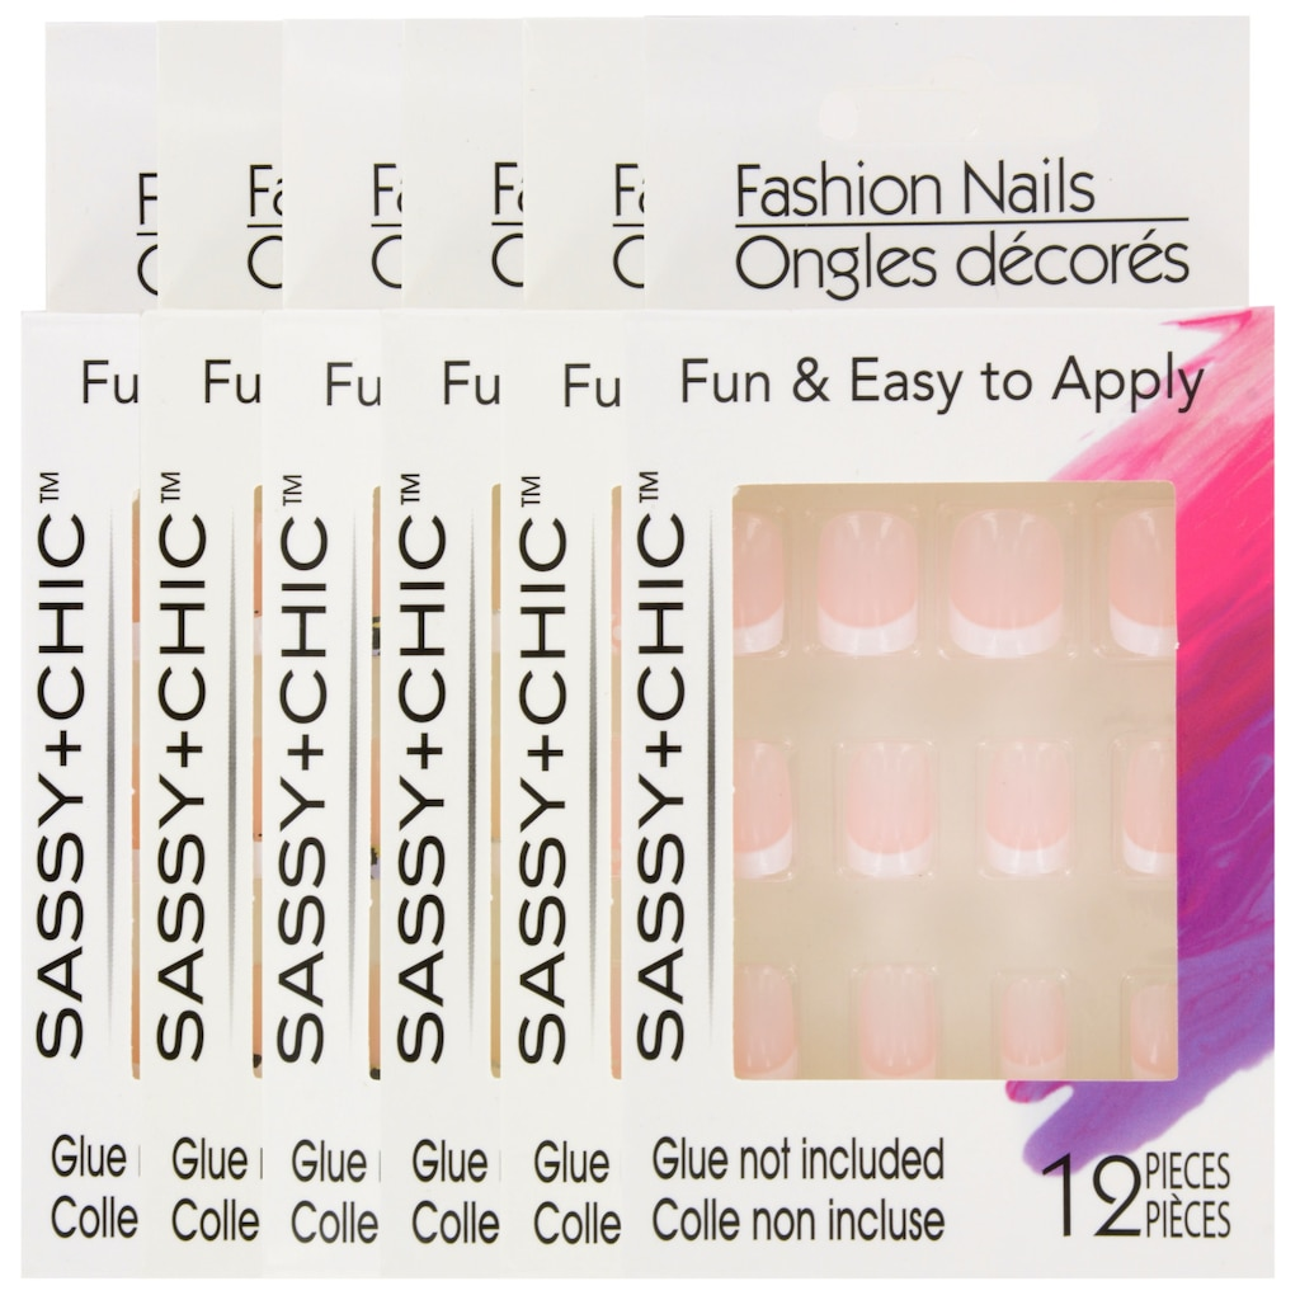 Sassy+Chic Glue-On French-Tip Fashion Nails, 12-pc  Sets